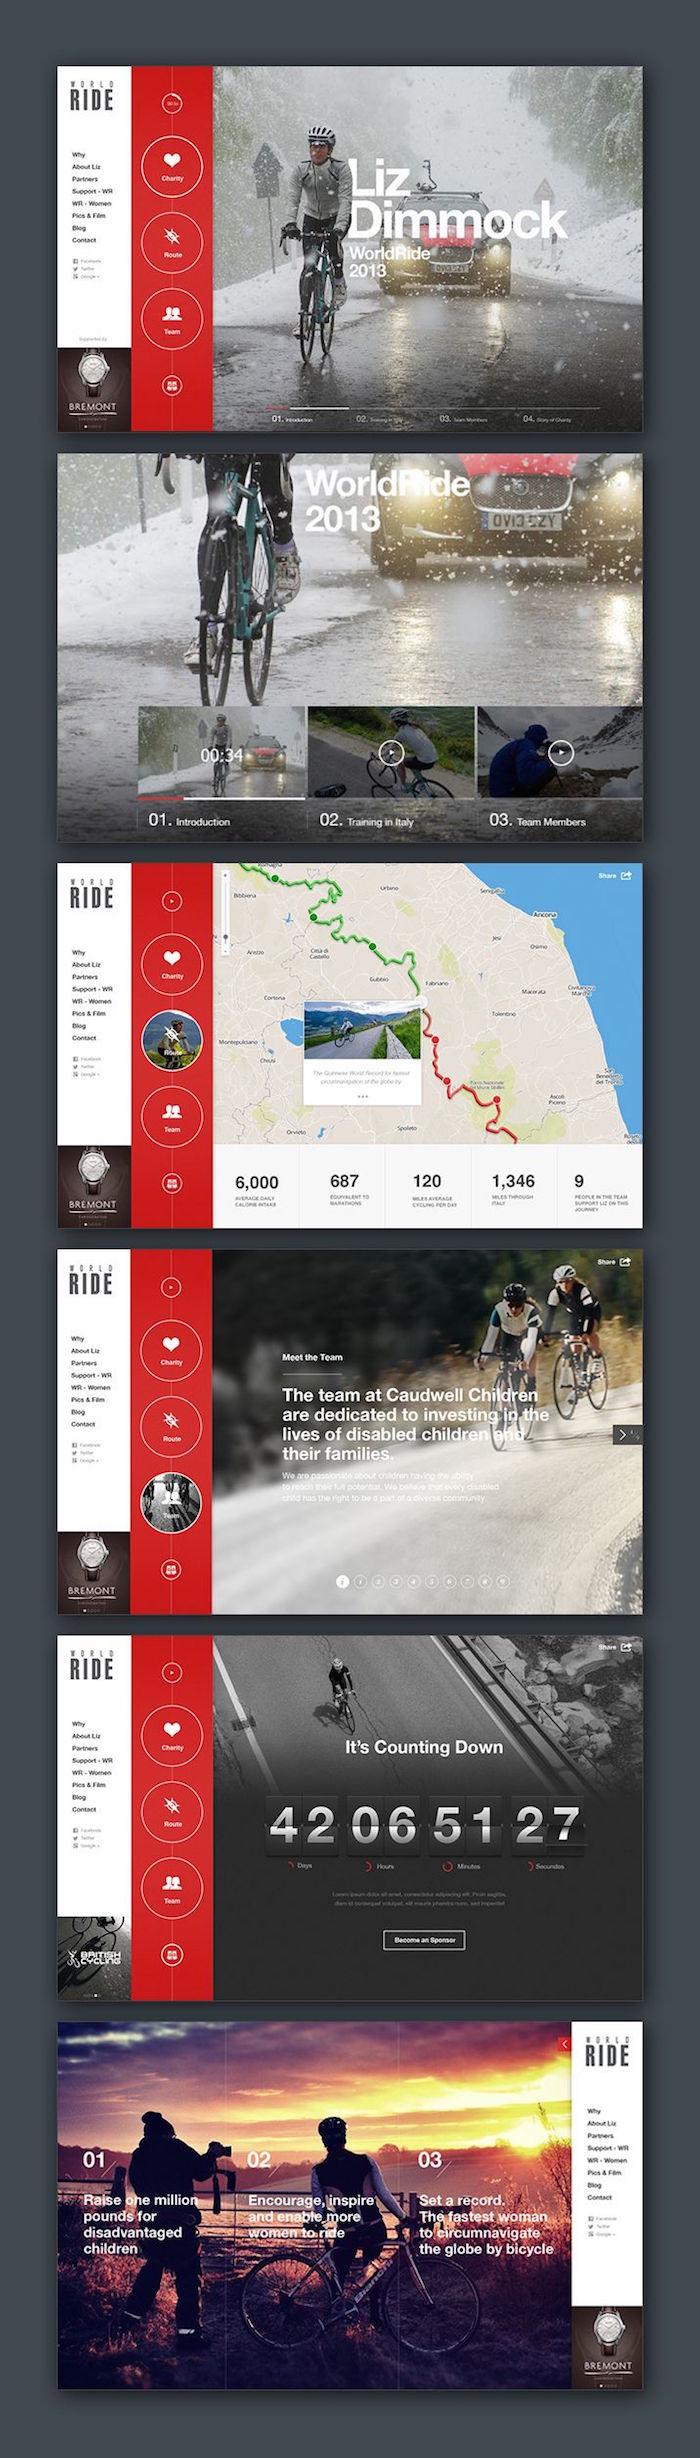 diseños web diciembre 2014 img 3